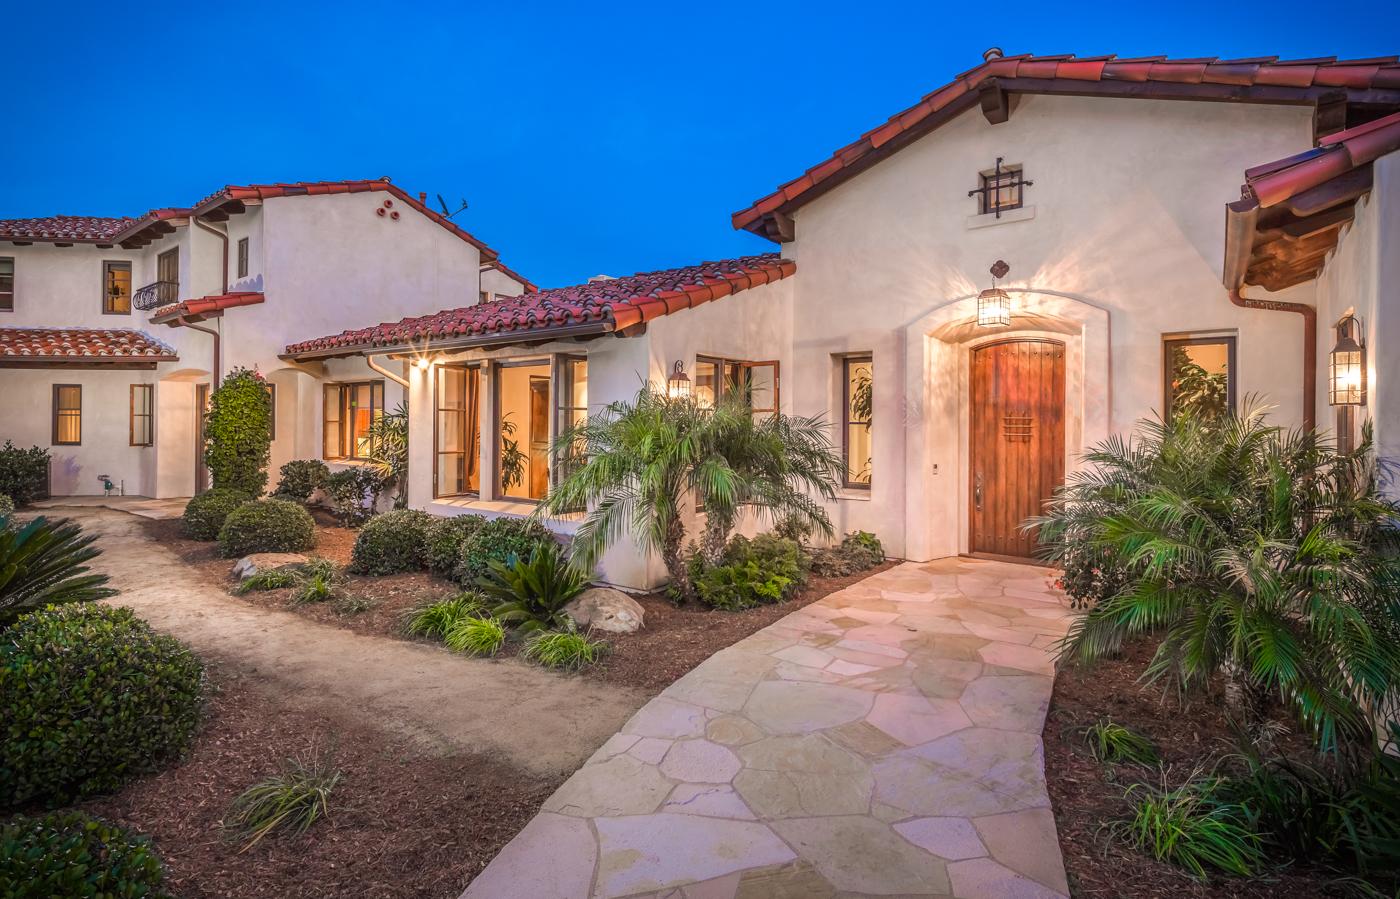 Sold 2018 Represented Buyer & Seller -  Rancho Santa Fe, CA 92067